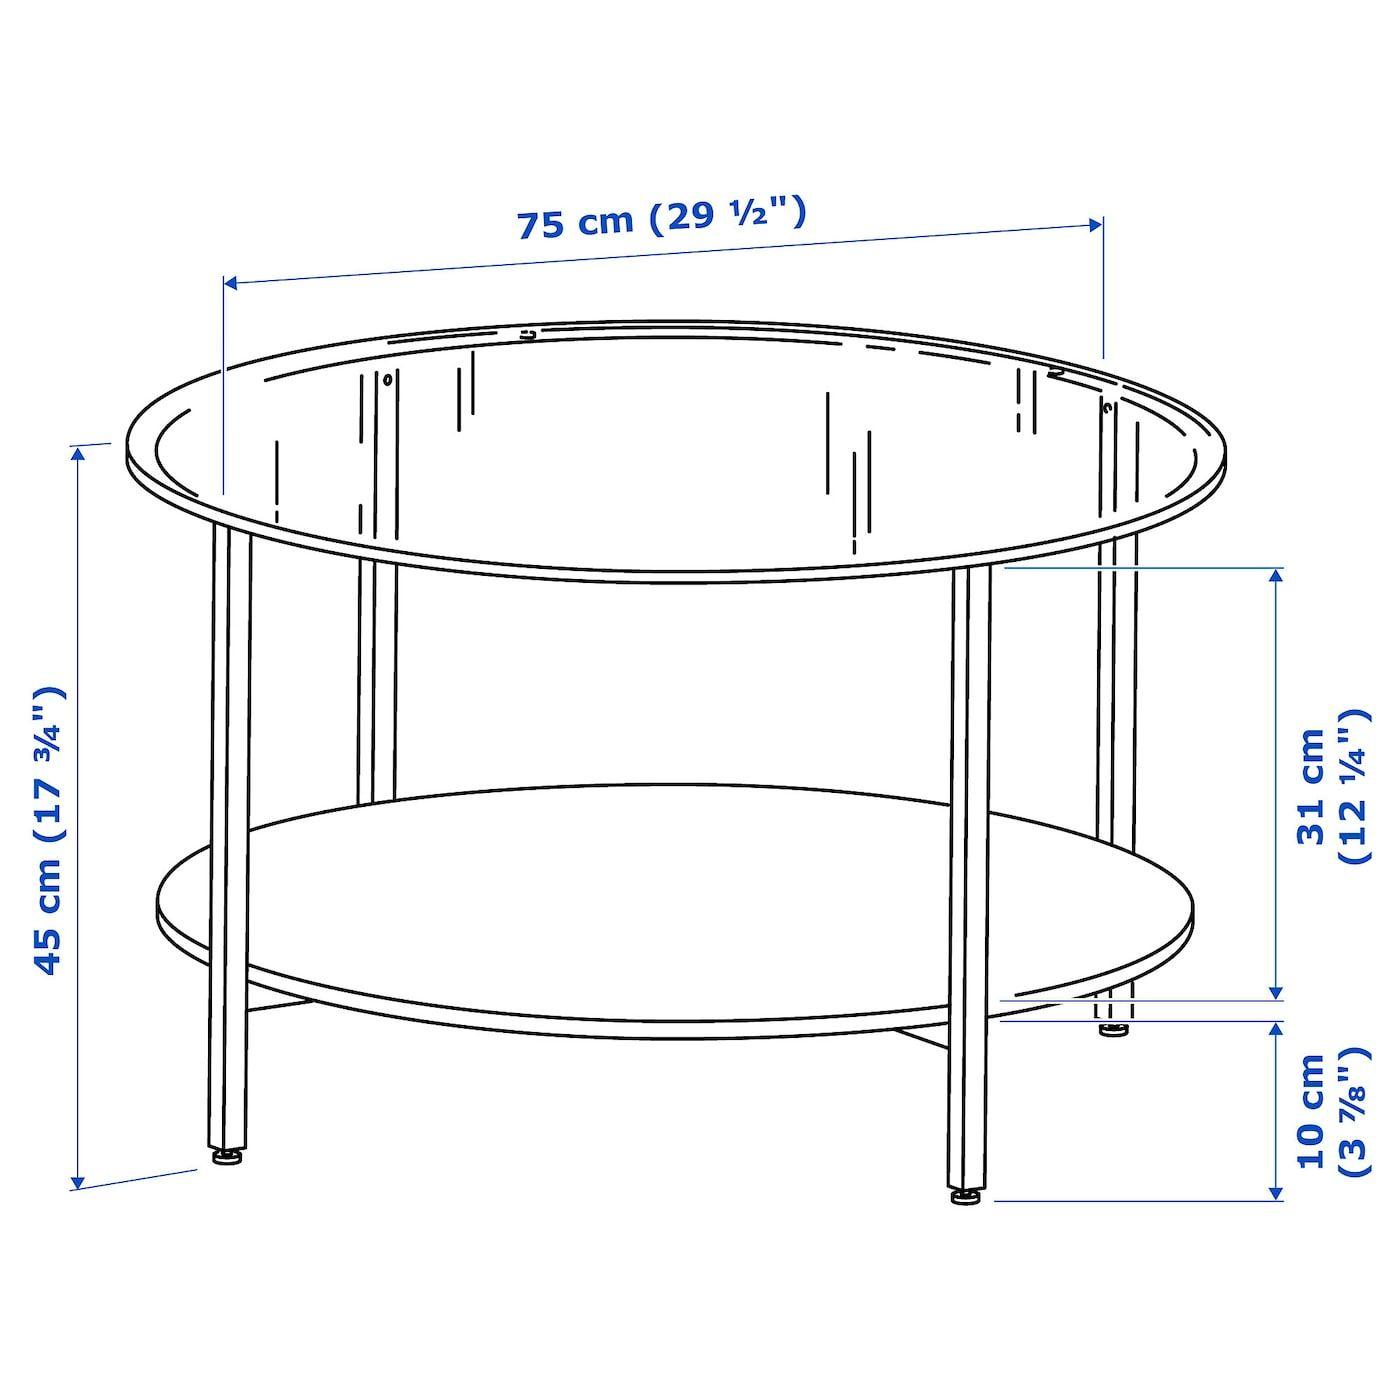 Vittsjo Coffee Table Black Brown Glass 291 2 75 Cm Ikea Coffee Table Glass Coffee Table Ikea [ 1400 x 1400 Pixel ]